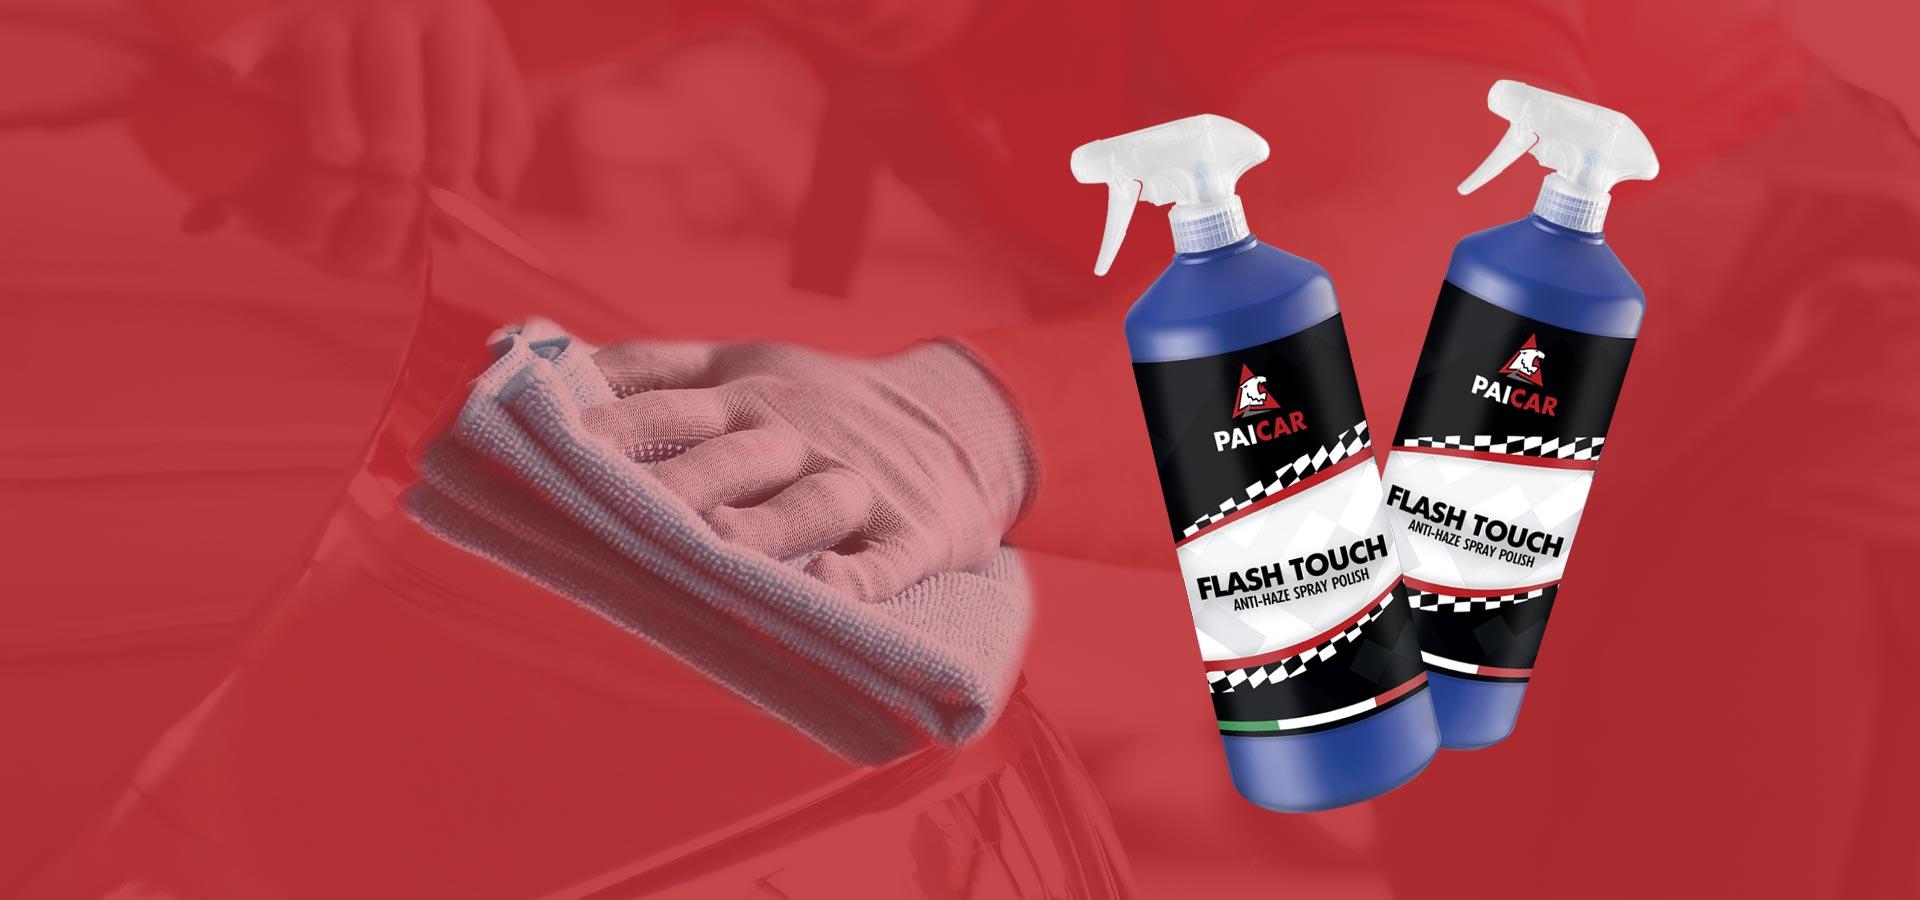 flash_touch_quick_detailer_spray_paicar_paicristal